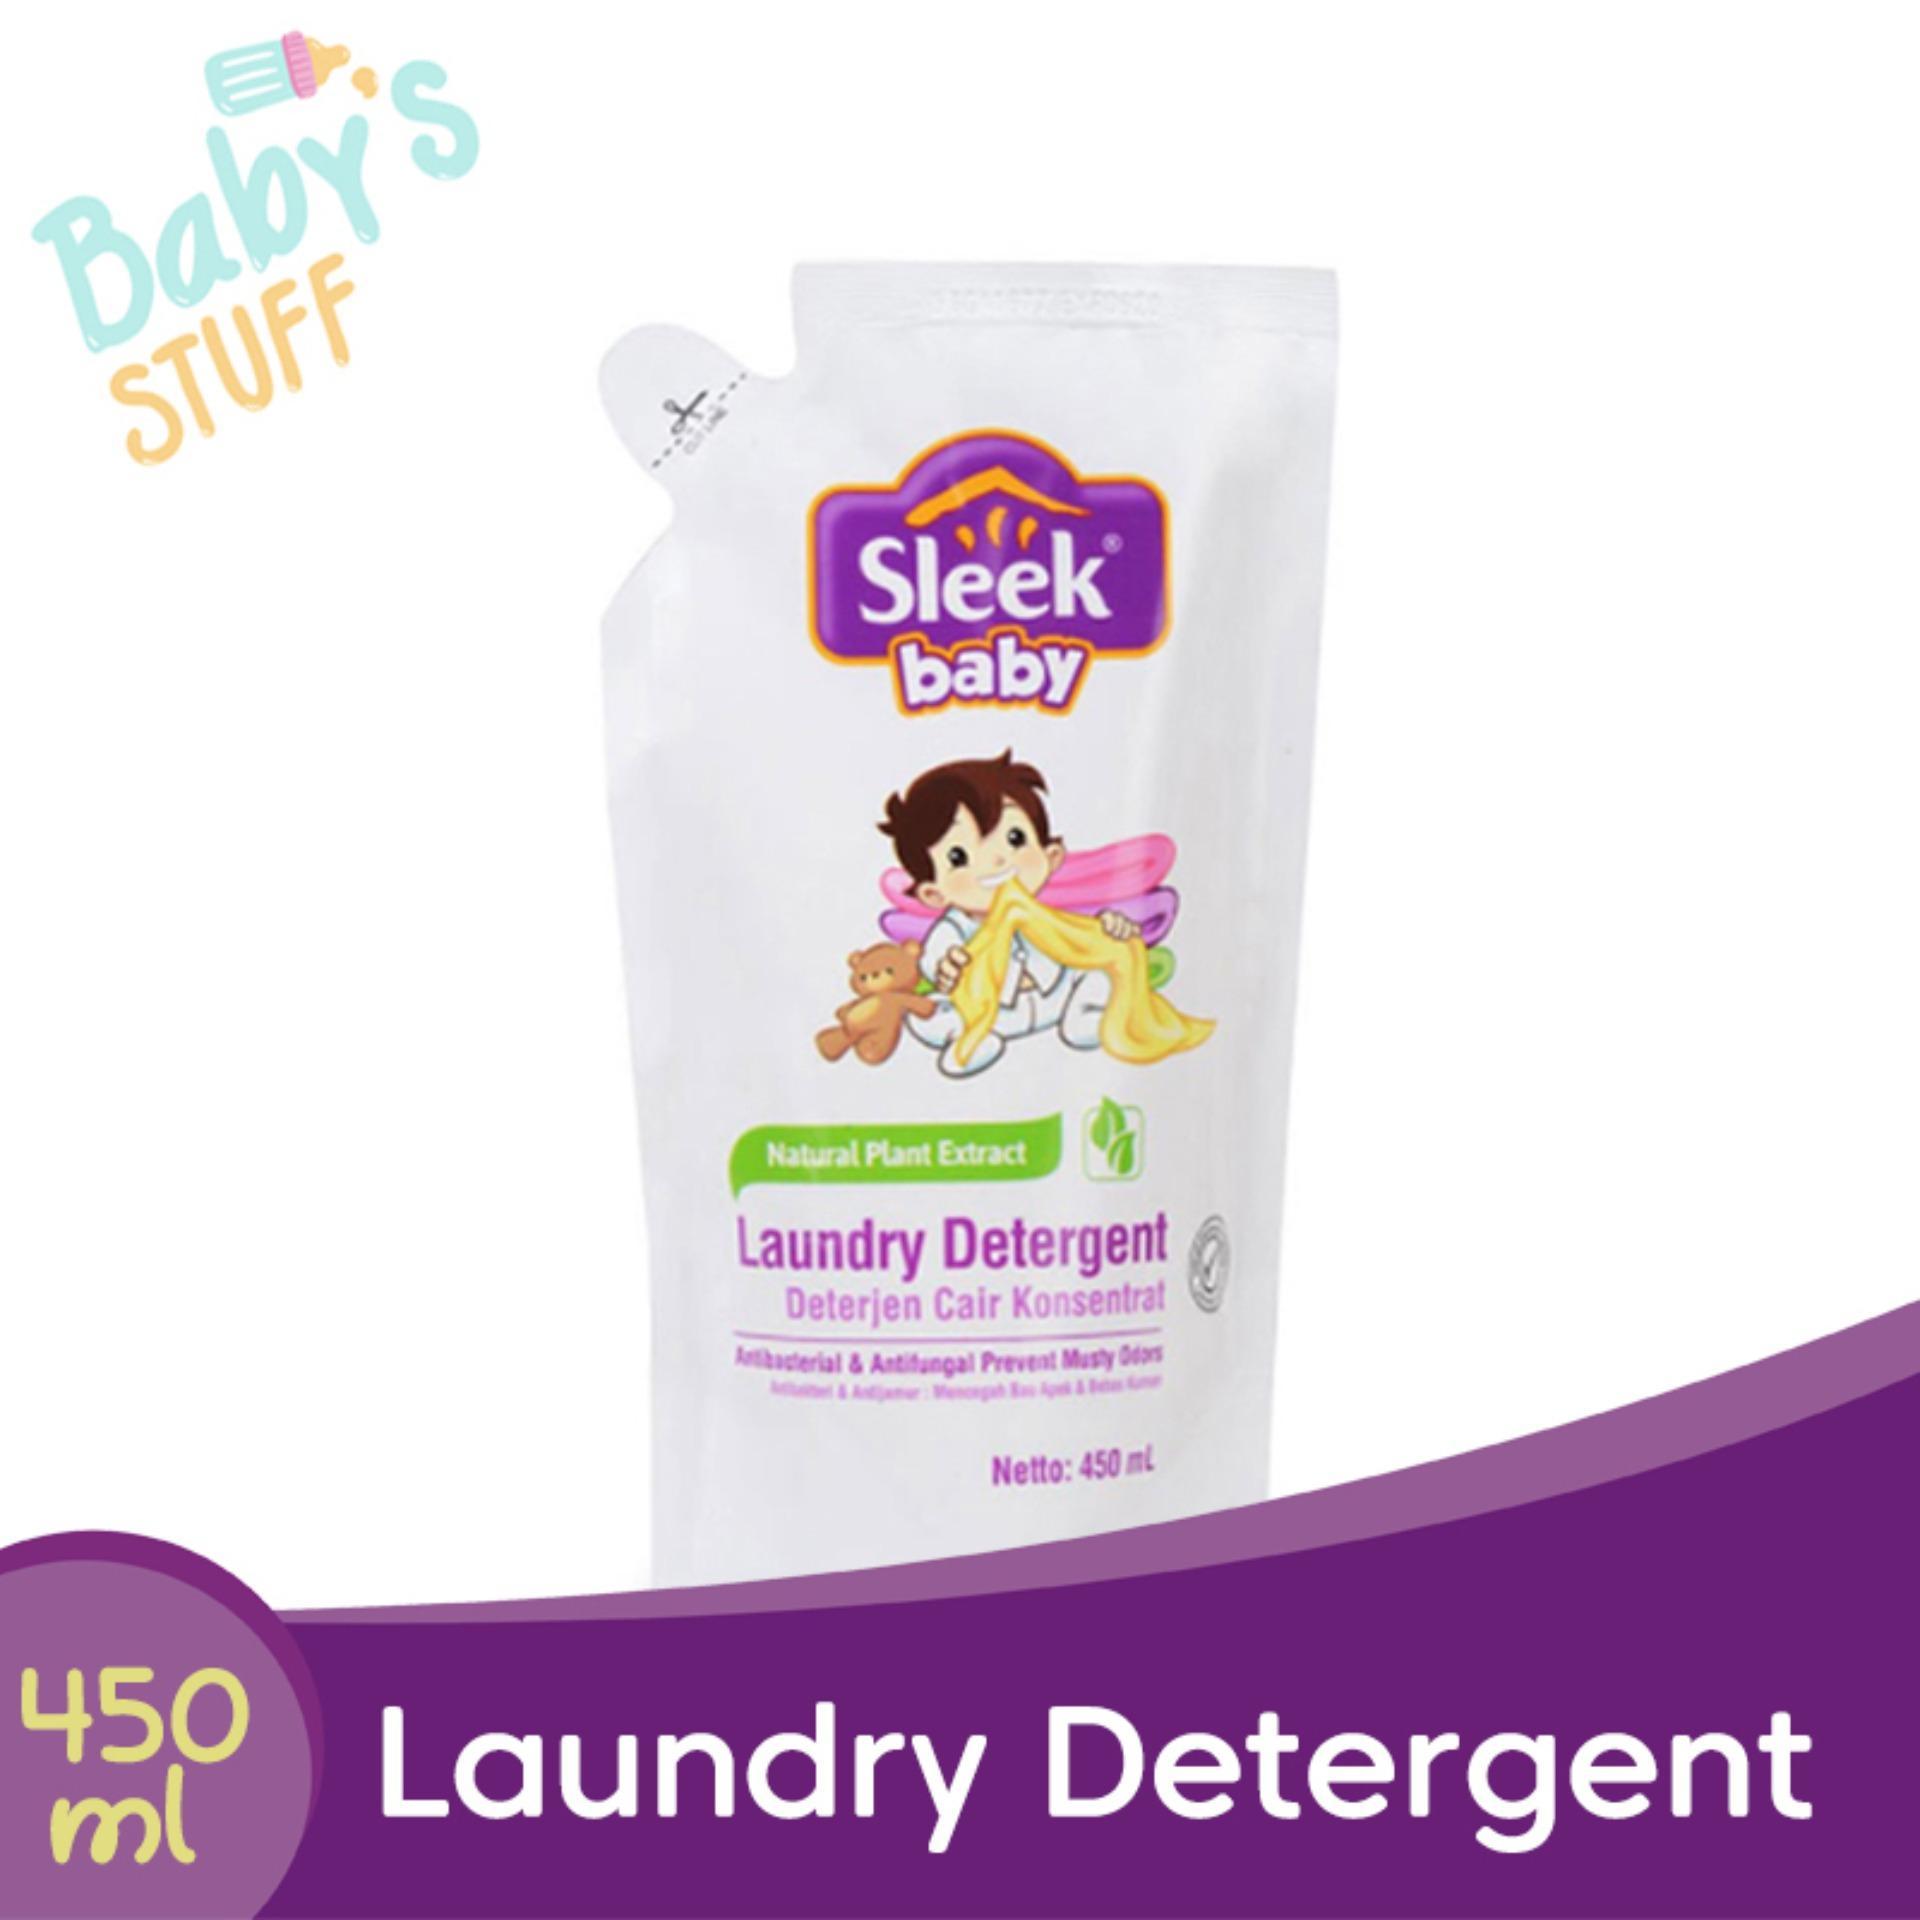 Sleek Baby Laundry Detergent Refill 450 Ml By Babys Stuff.